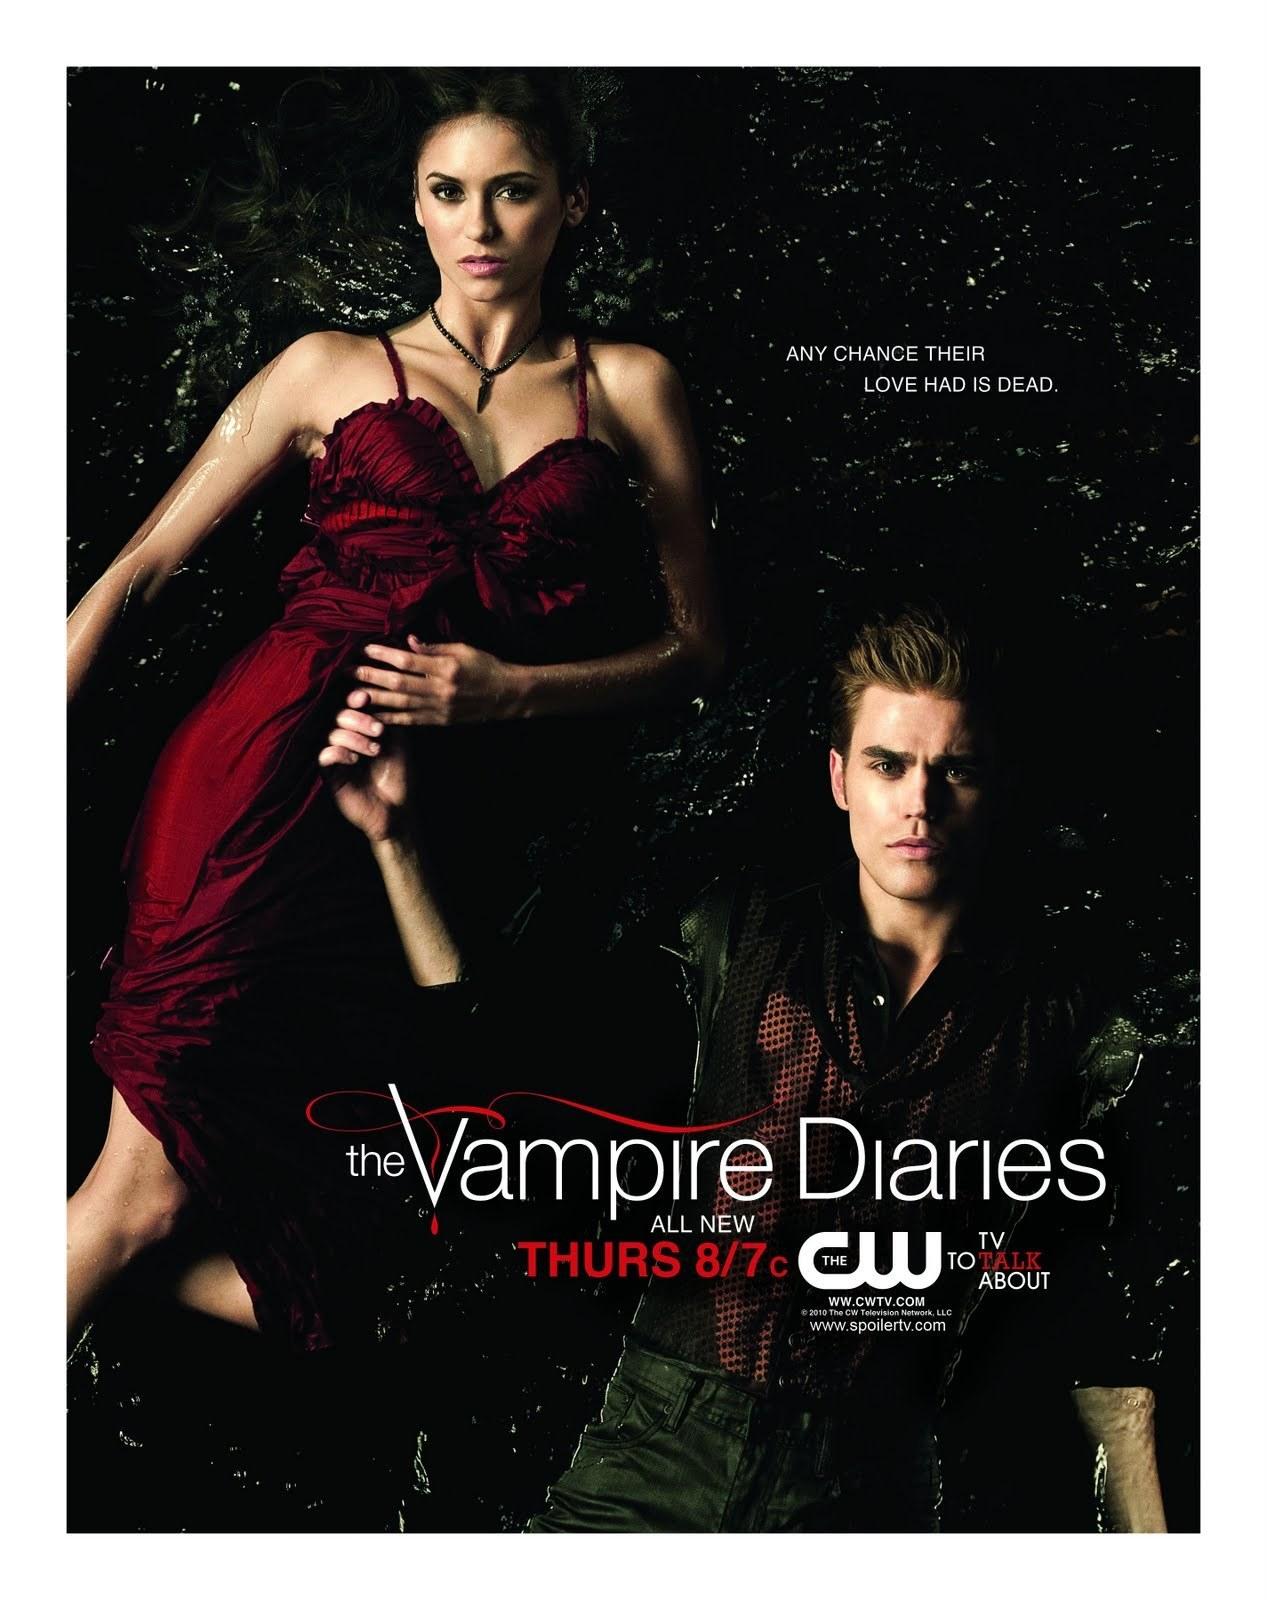 Смотреть онлайн vampyre lovers 2010 dvdrip 22 фотография